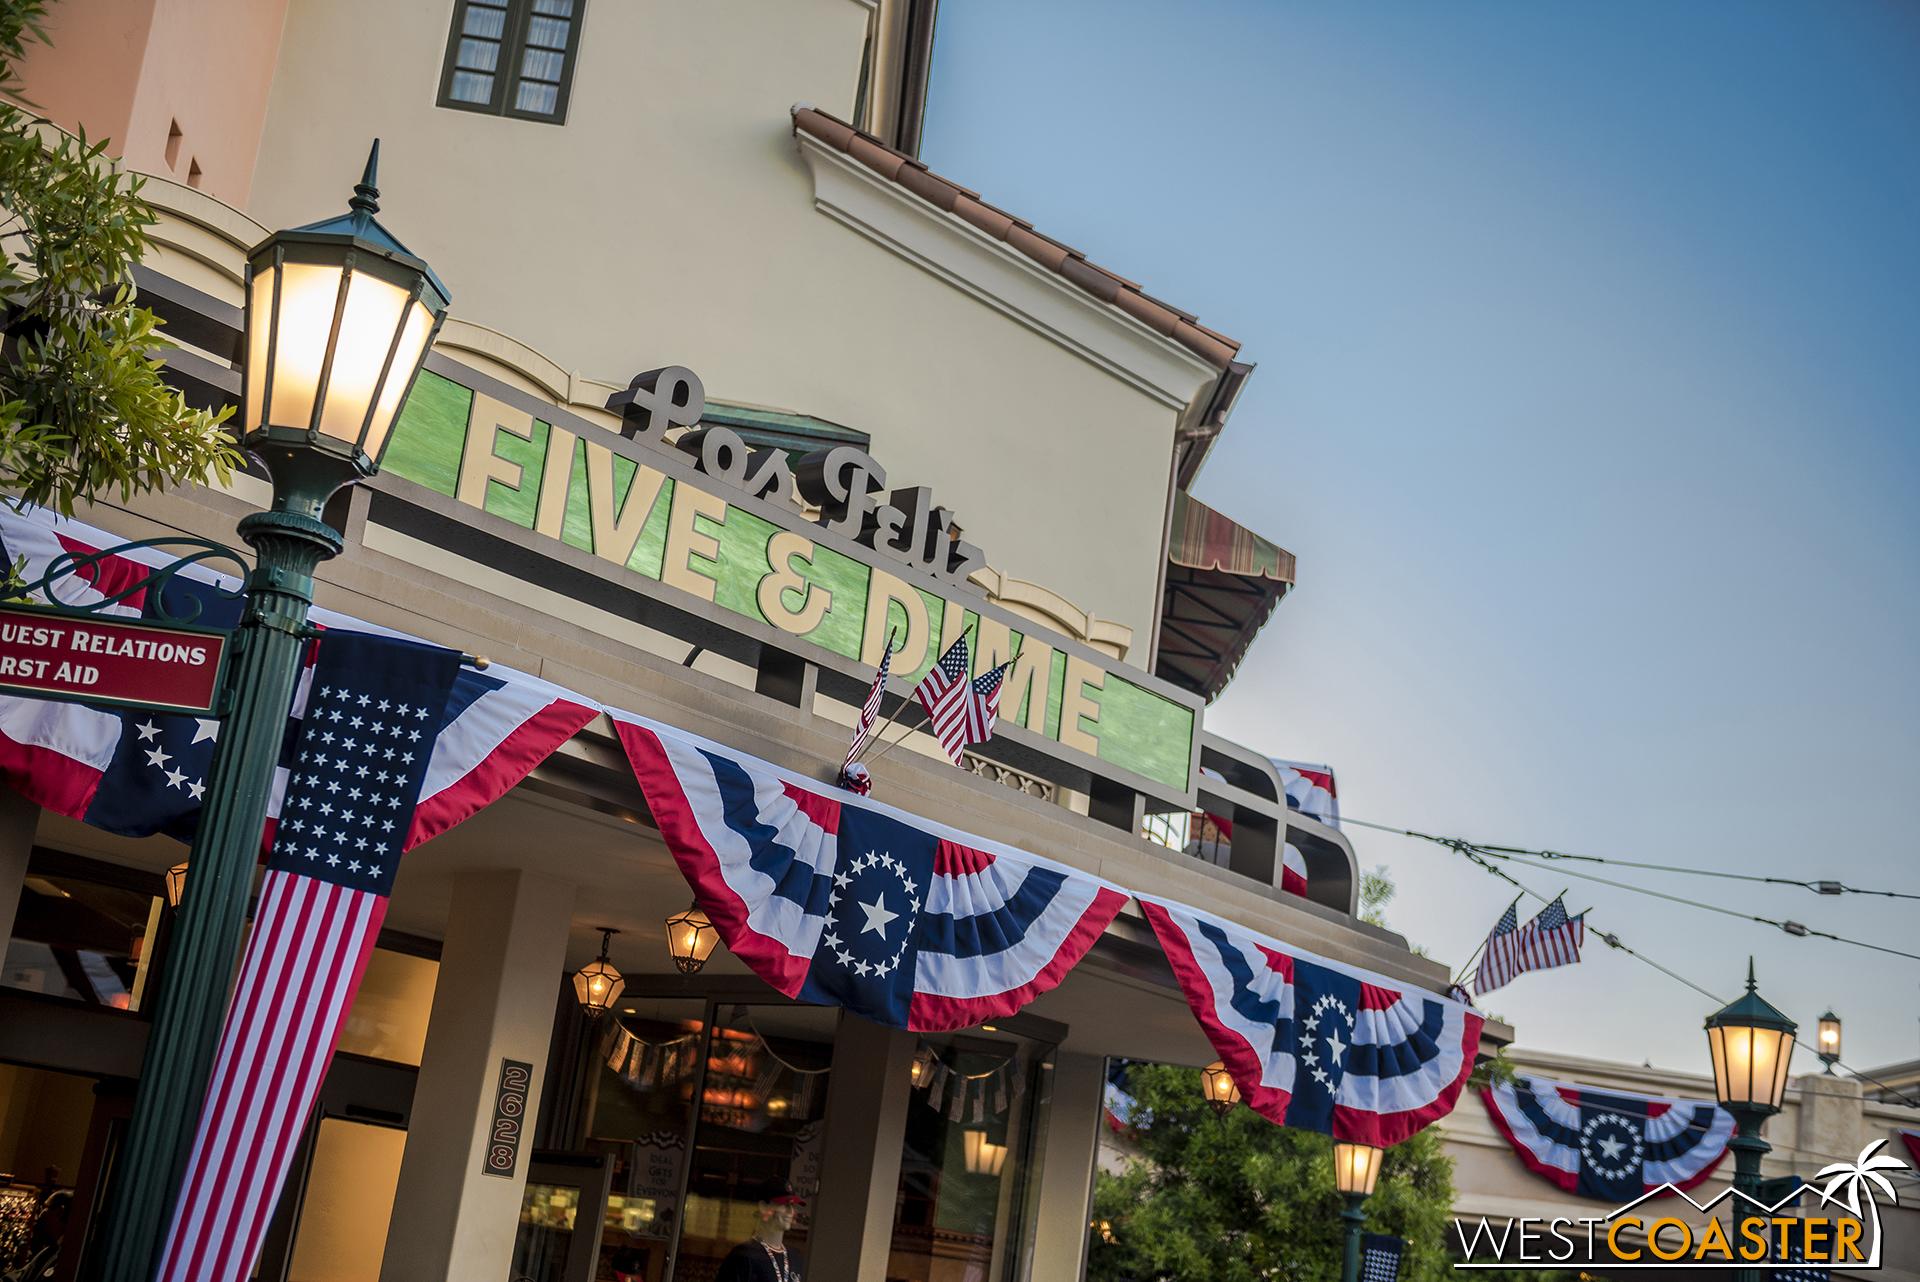 New patriotic decorations at Buena Vista Street this weekend.